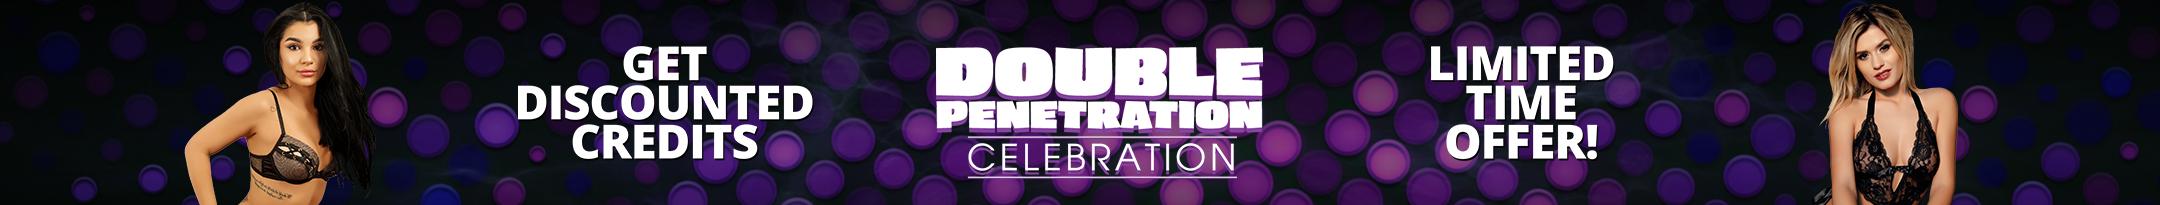 Double Penetration Celebration Promo